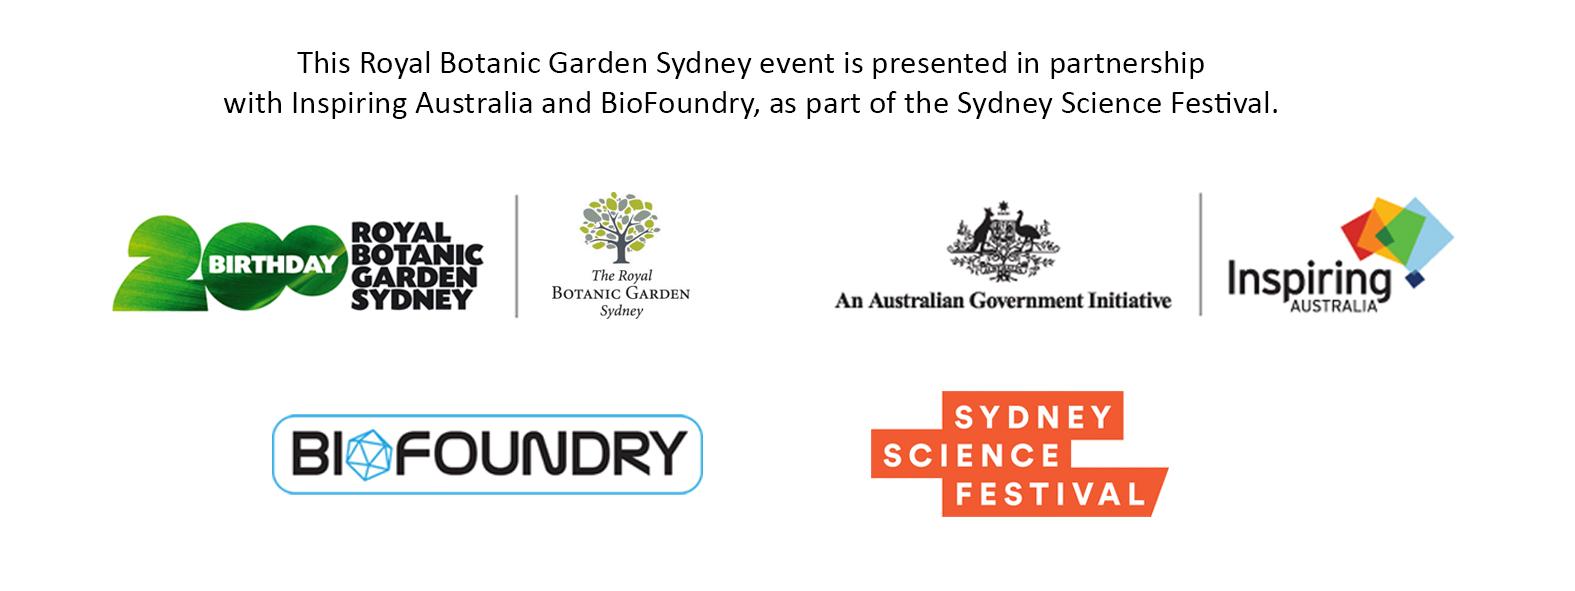 Logos: The Royal Botanic Garden Sydney, Inspiring Australia, BioFoundry and the Sydney Science Festival